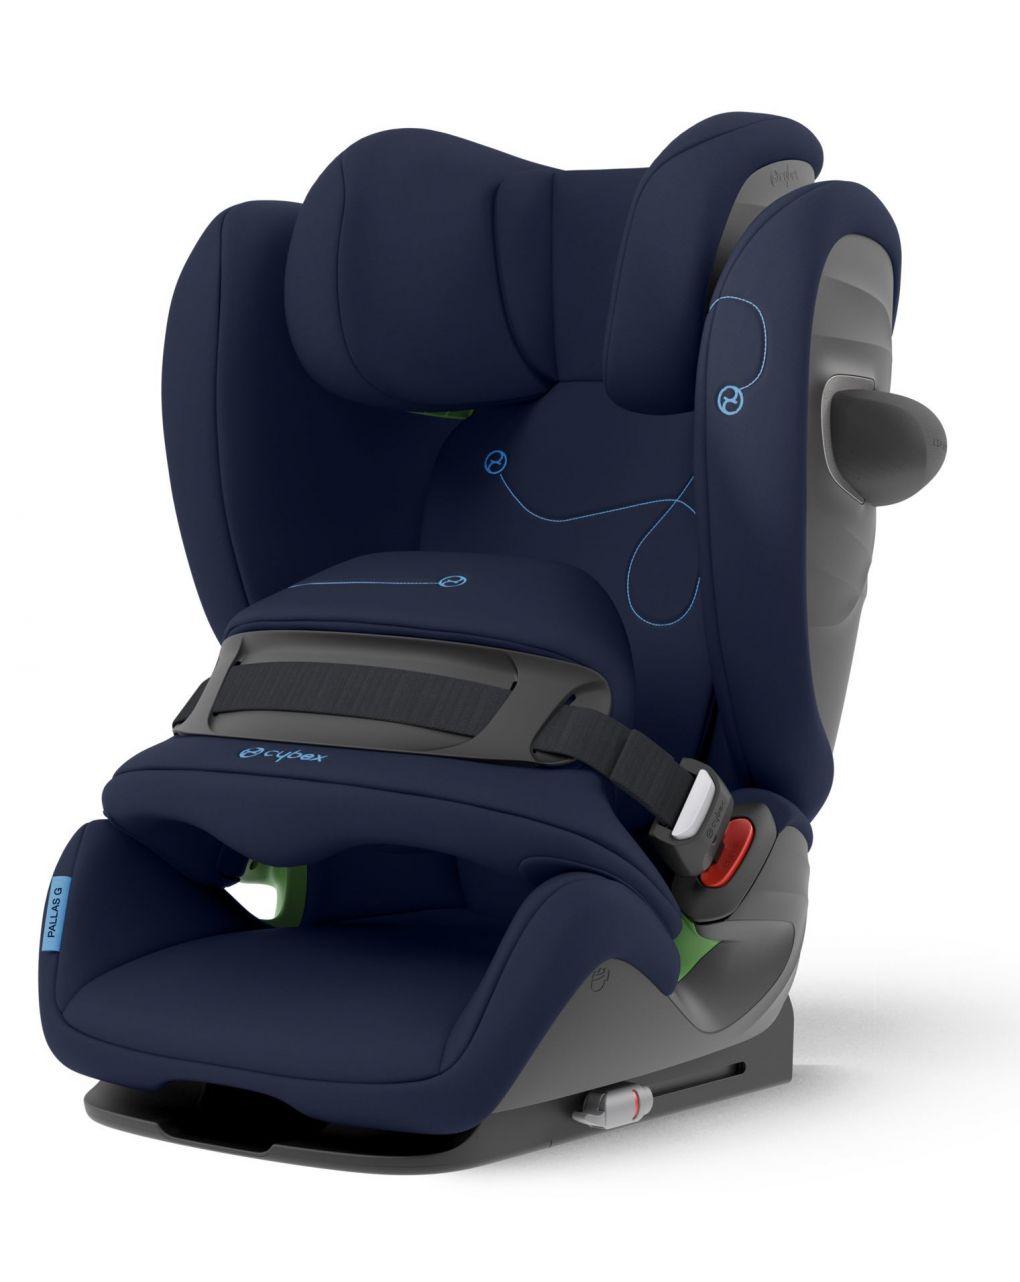 Cybex Κάθισμα Αυτοκινήτου Pallas G I-Size - Μπλε